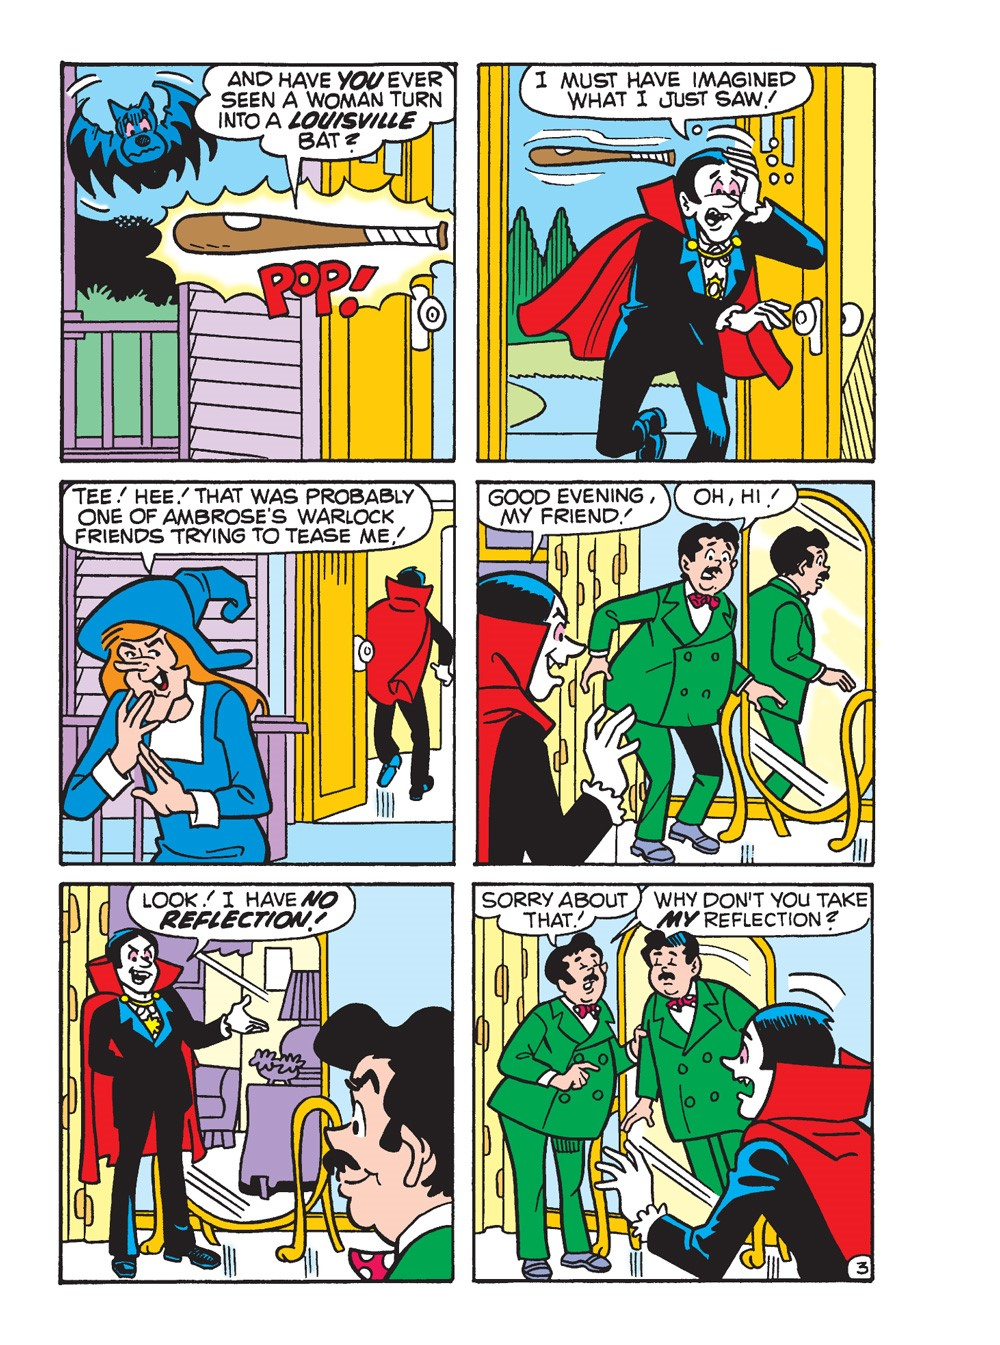 BettyAndVeronicaJumboComicsDigest_297_038 ComicList Previews: BETTY AND VERONICA JUMBO COMICS DIGEST #297